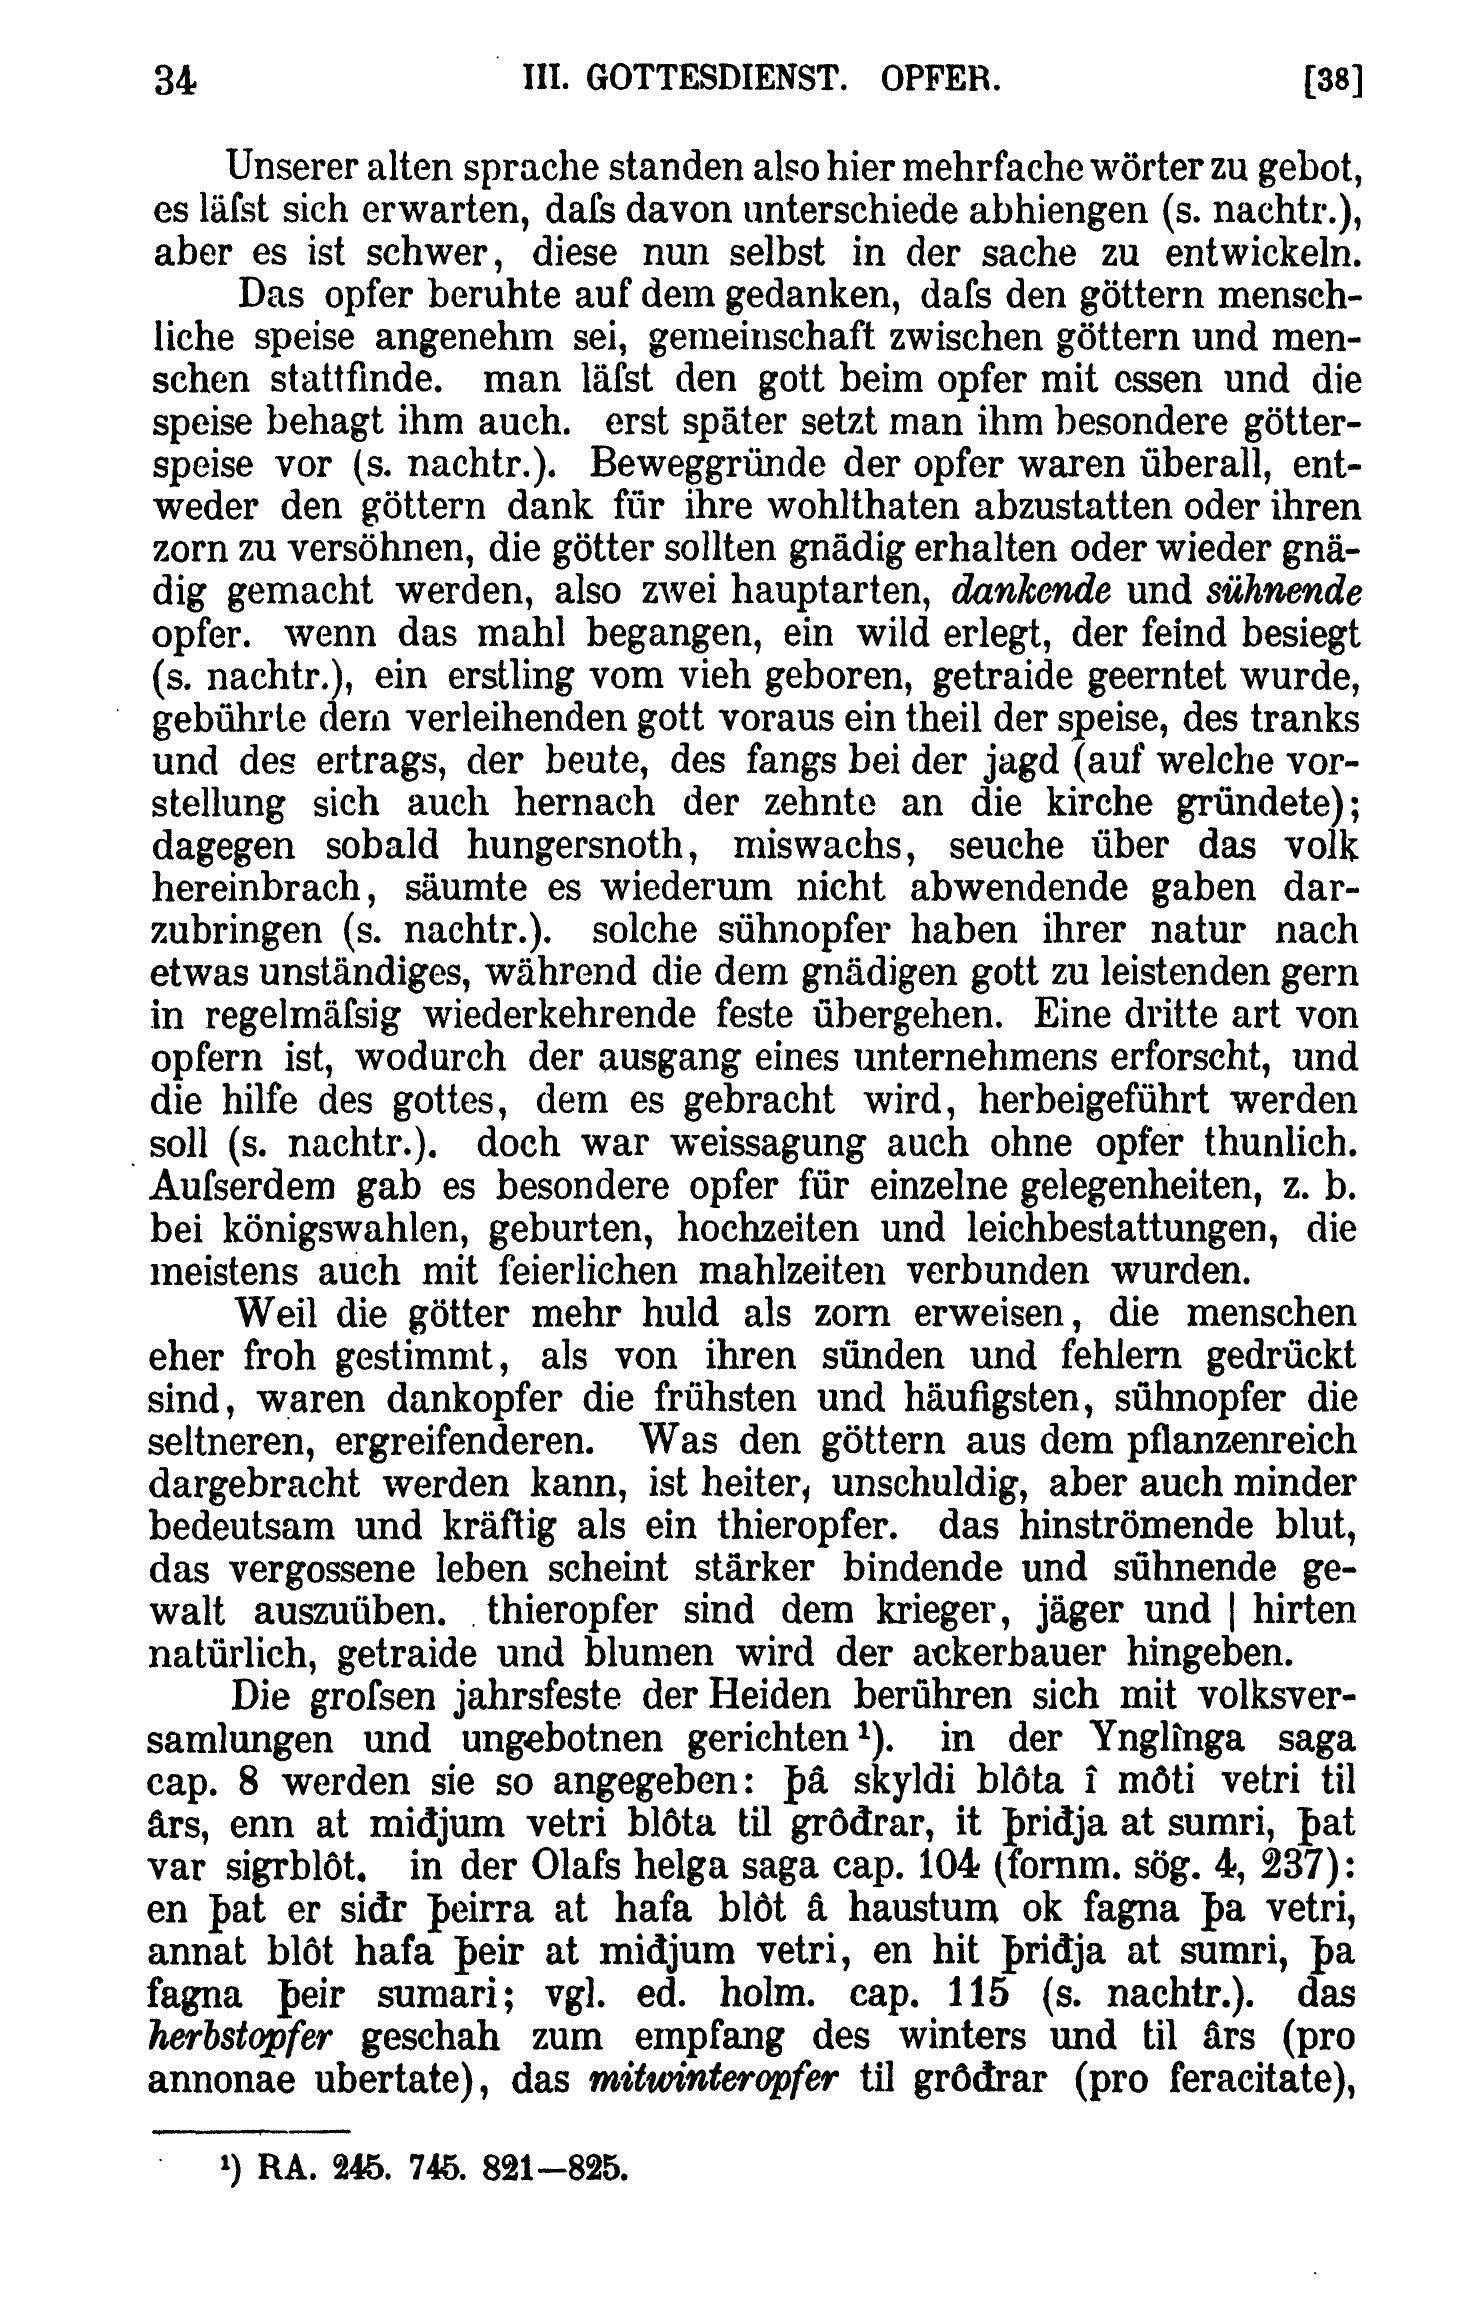 File:Deutsche Mythologie (Grimm) V1 078.jpg - Wikimedia Commons